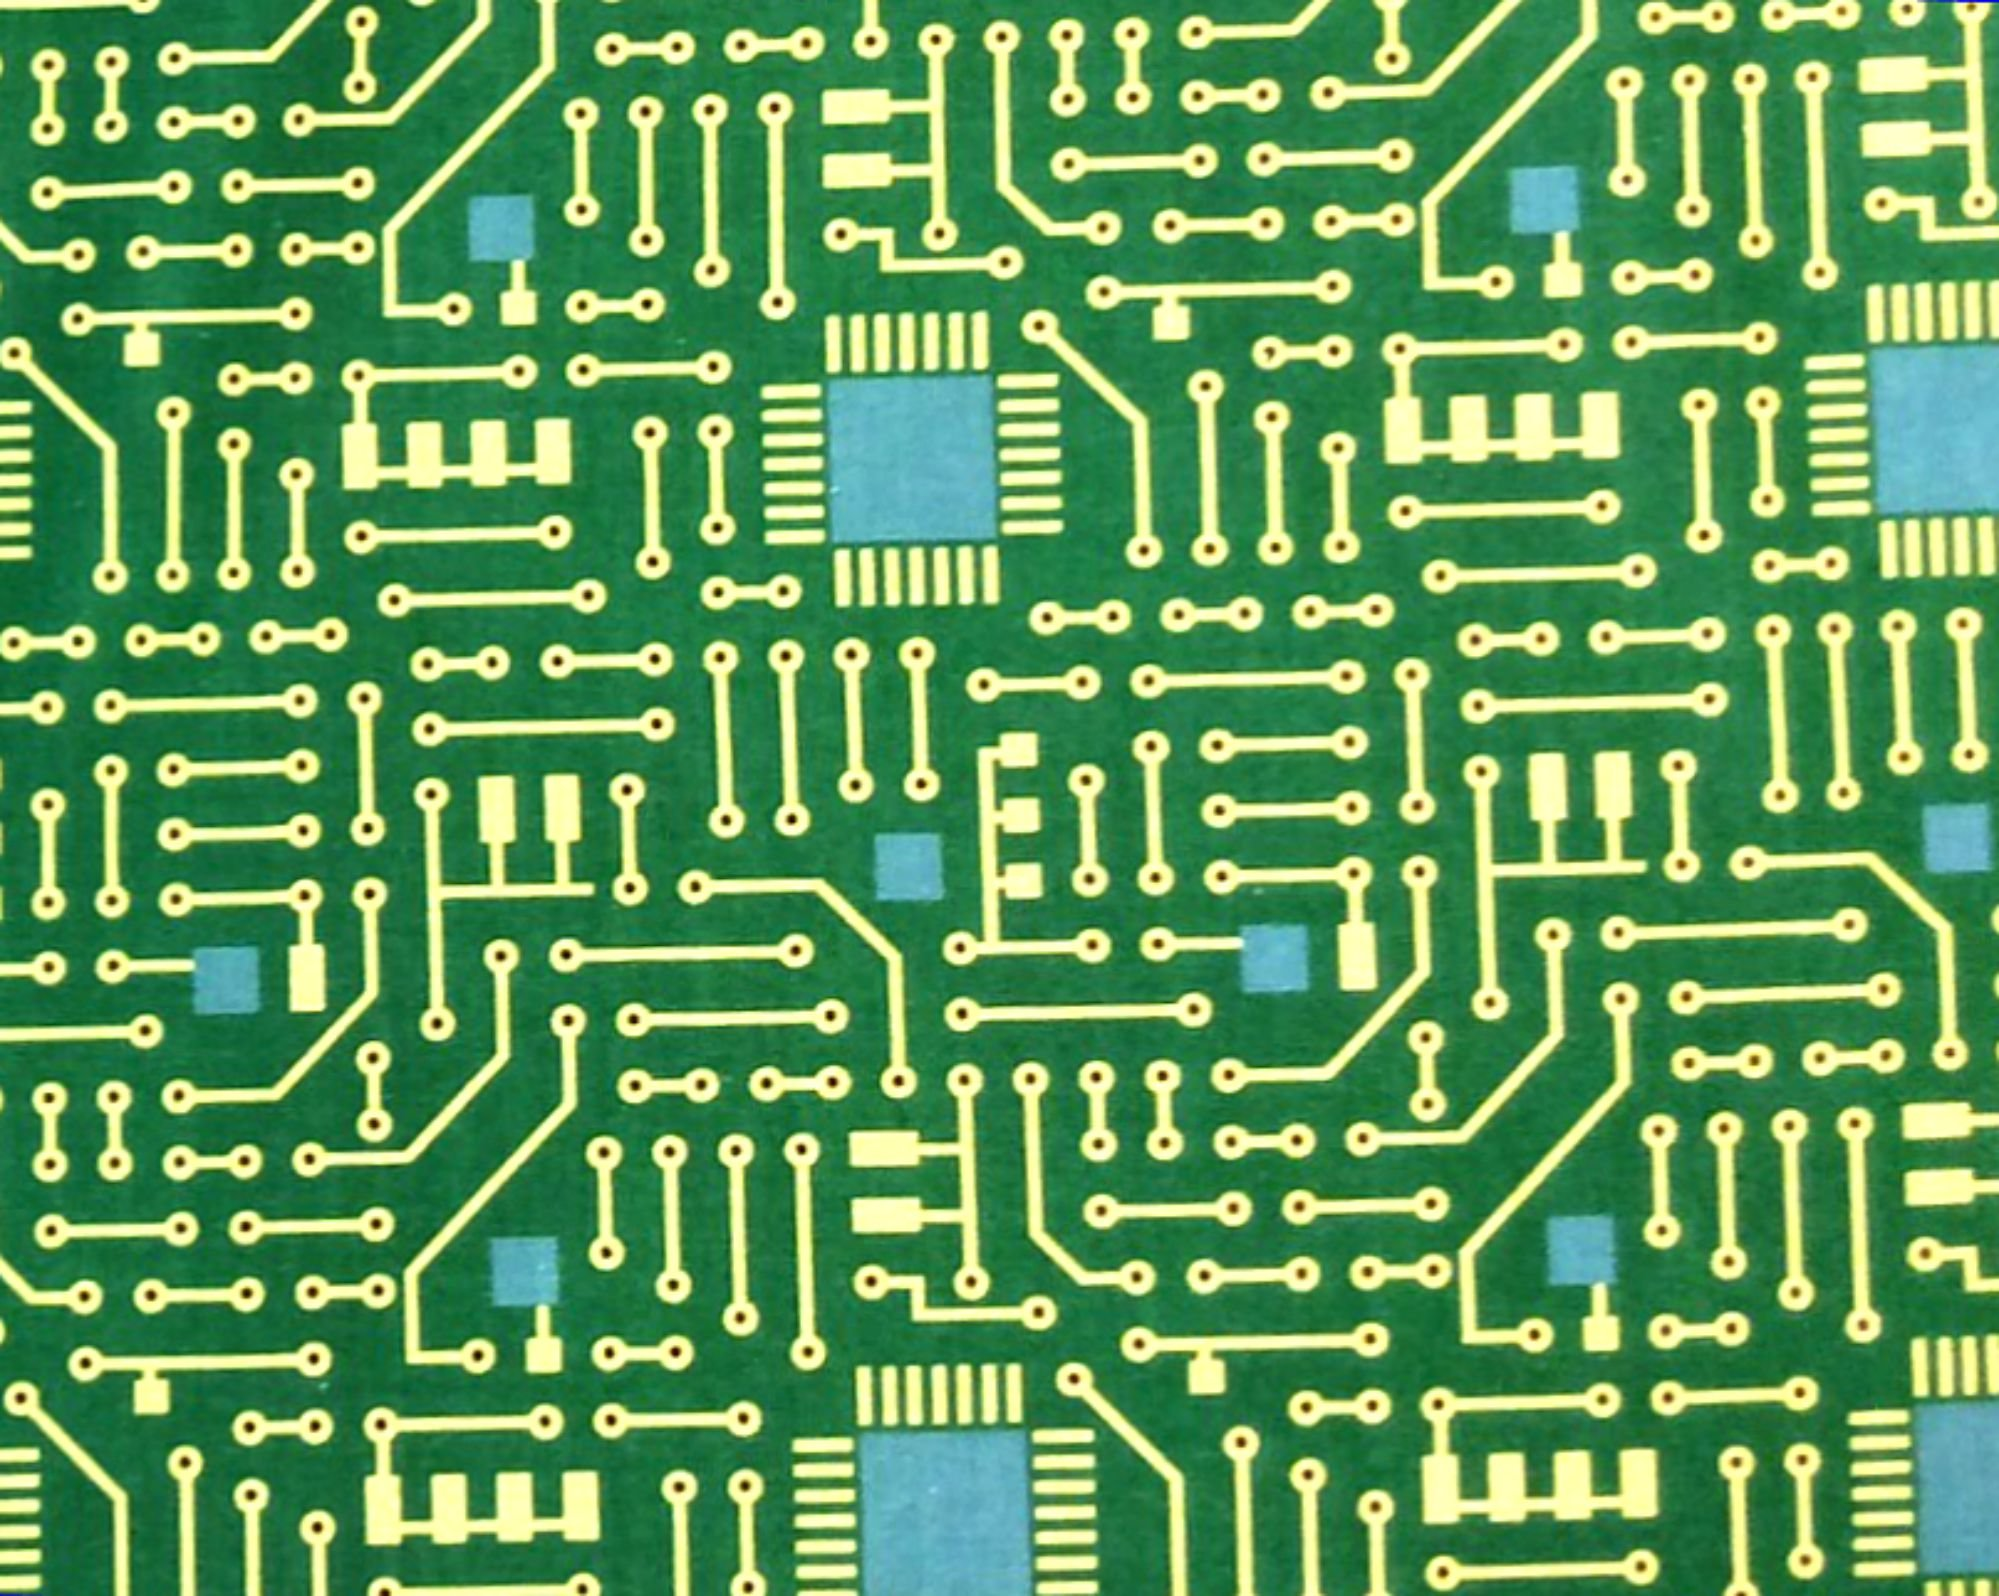 Electronics Retro CIrcuit Board Analog STEM Engineering 100% Cotton BE29